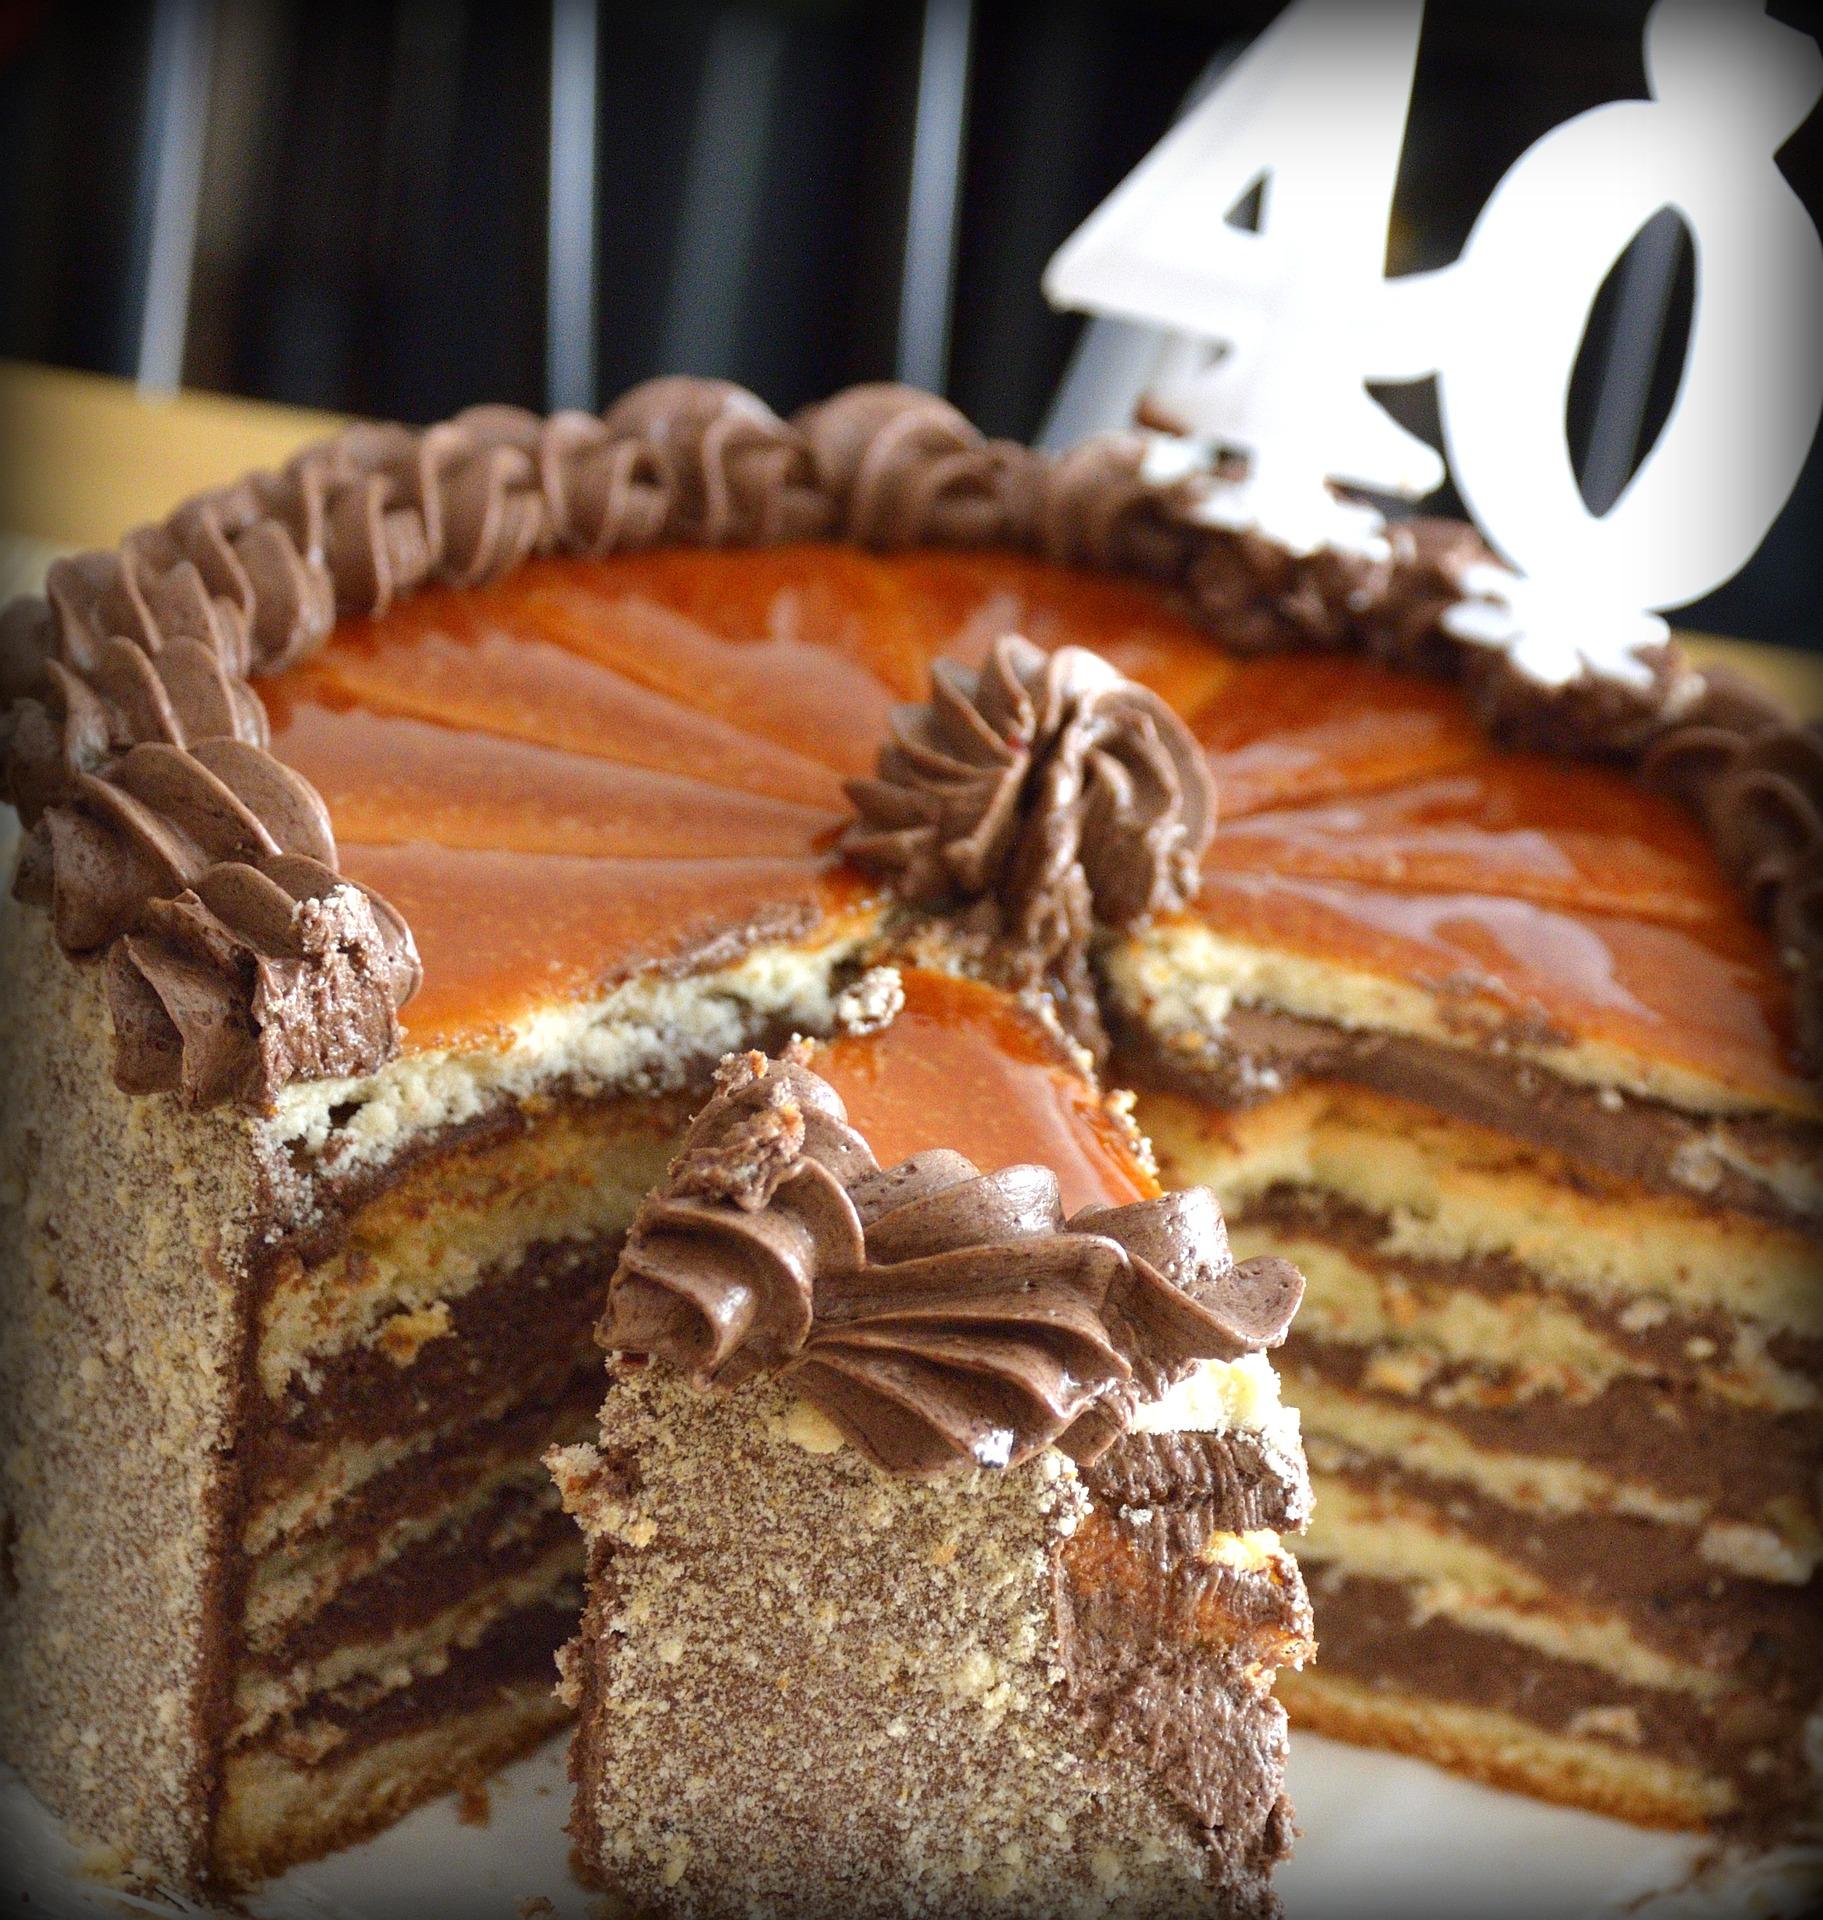 cake-2796992_1920.jpg